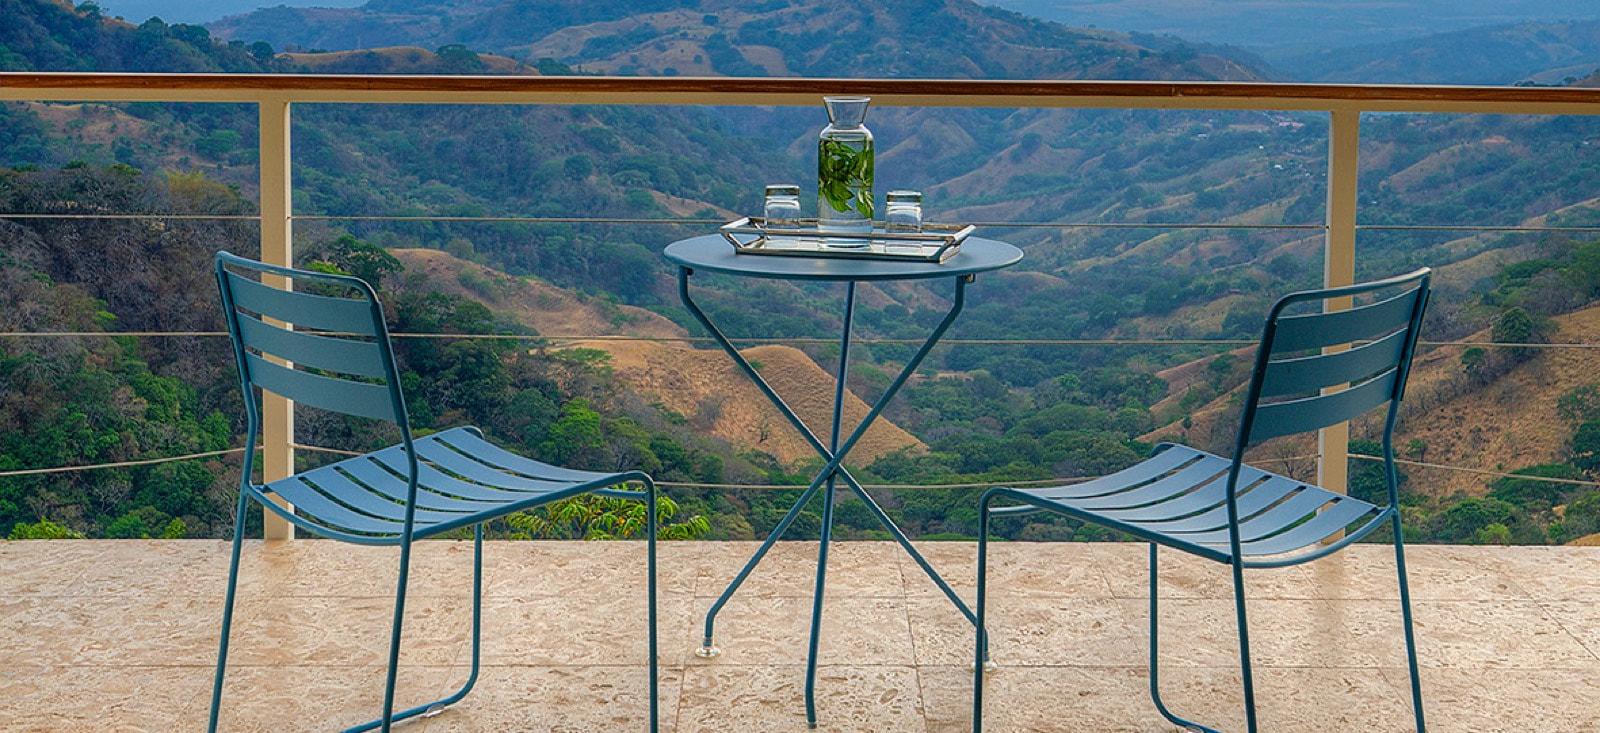 casita-terrace-2_8_orig.jpg